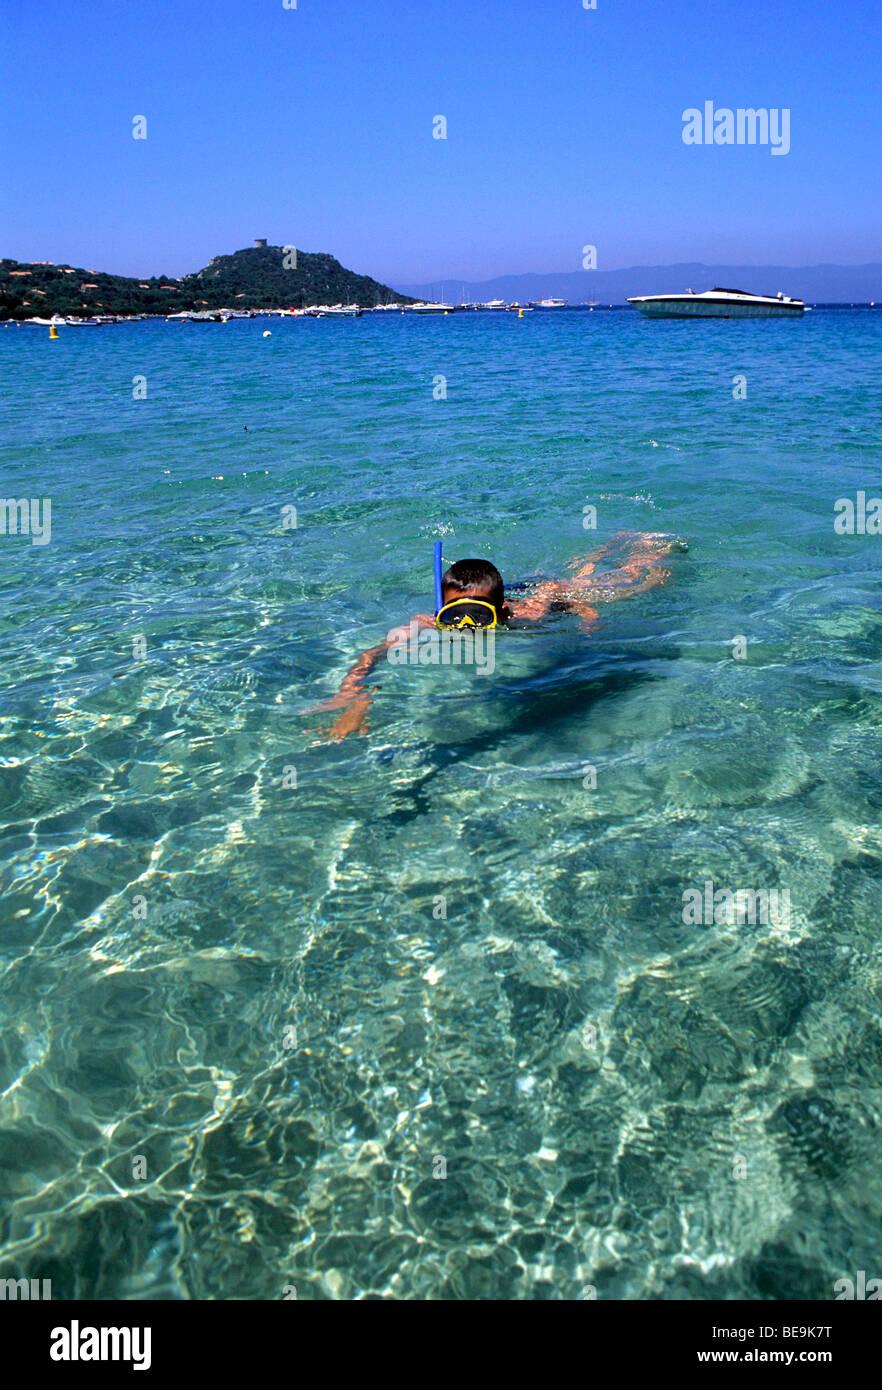 Leisures: Swimming - Stock Image